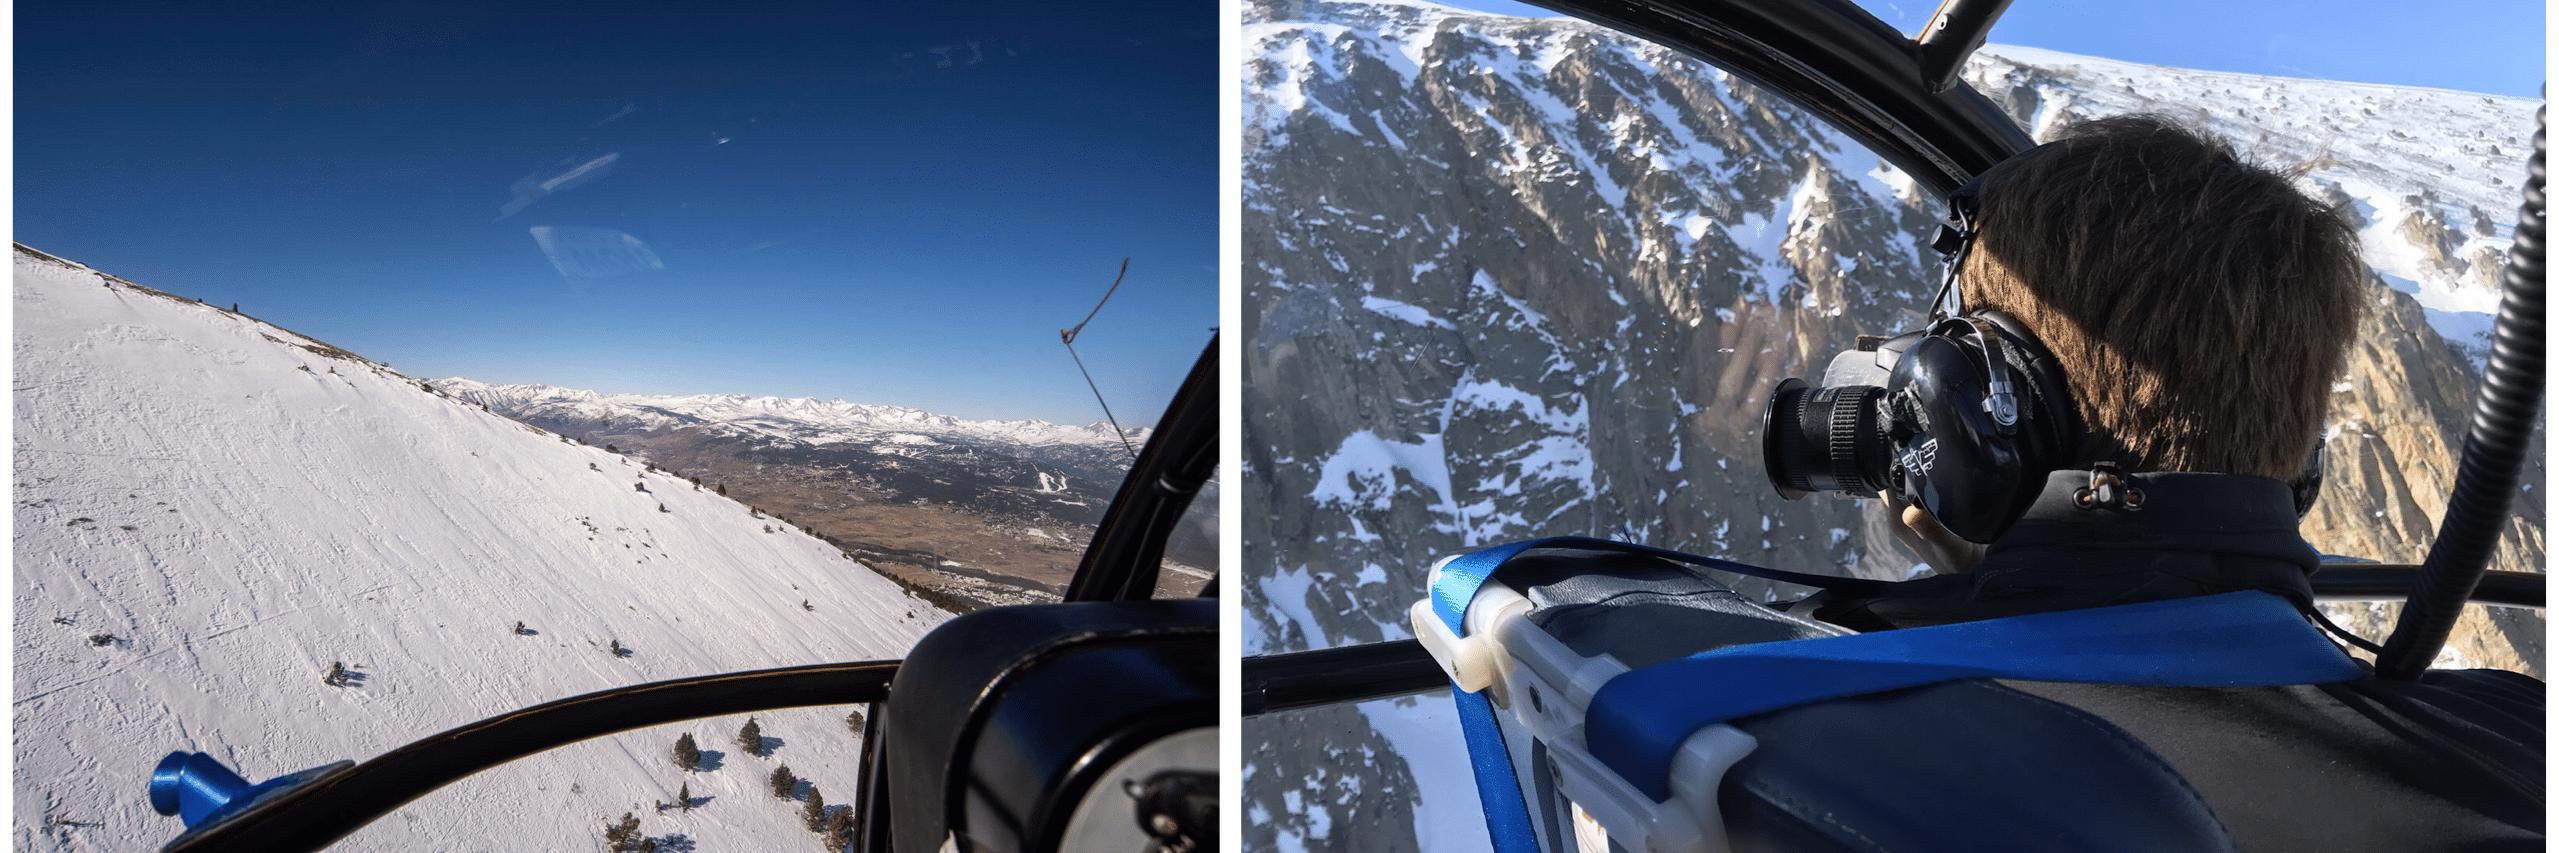 cerdagne helico des neiges